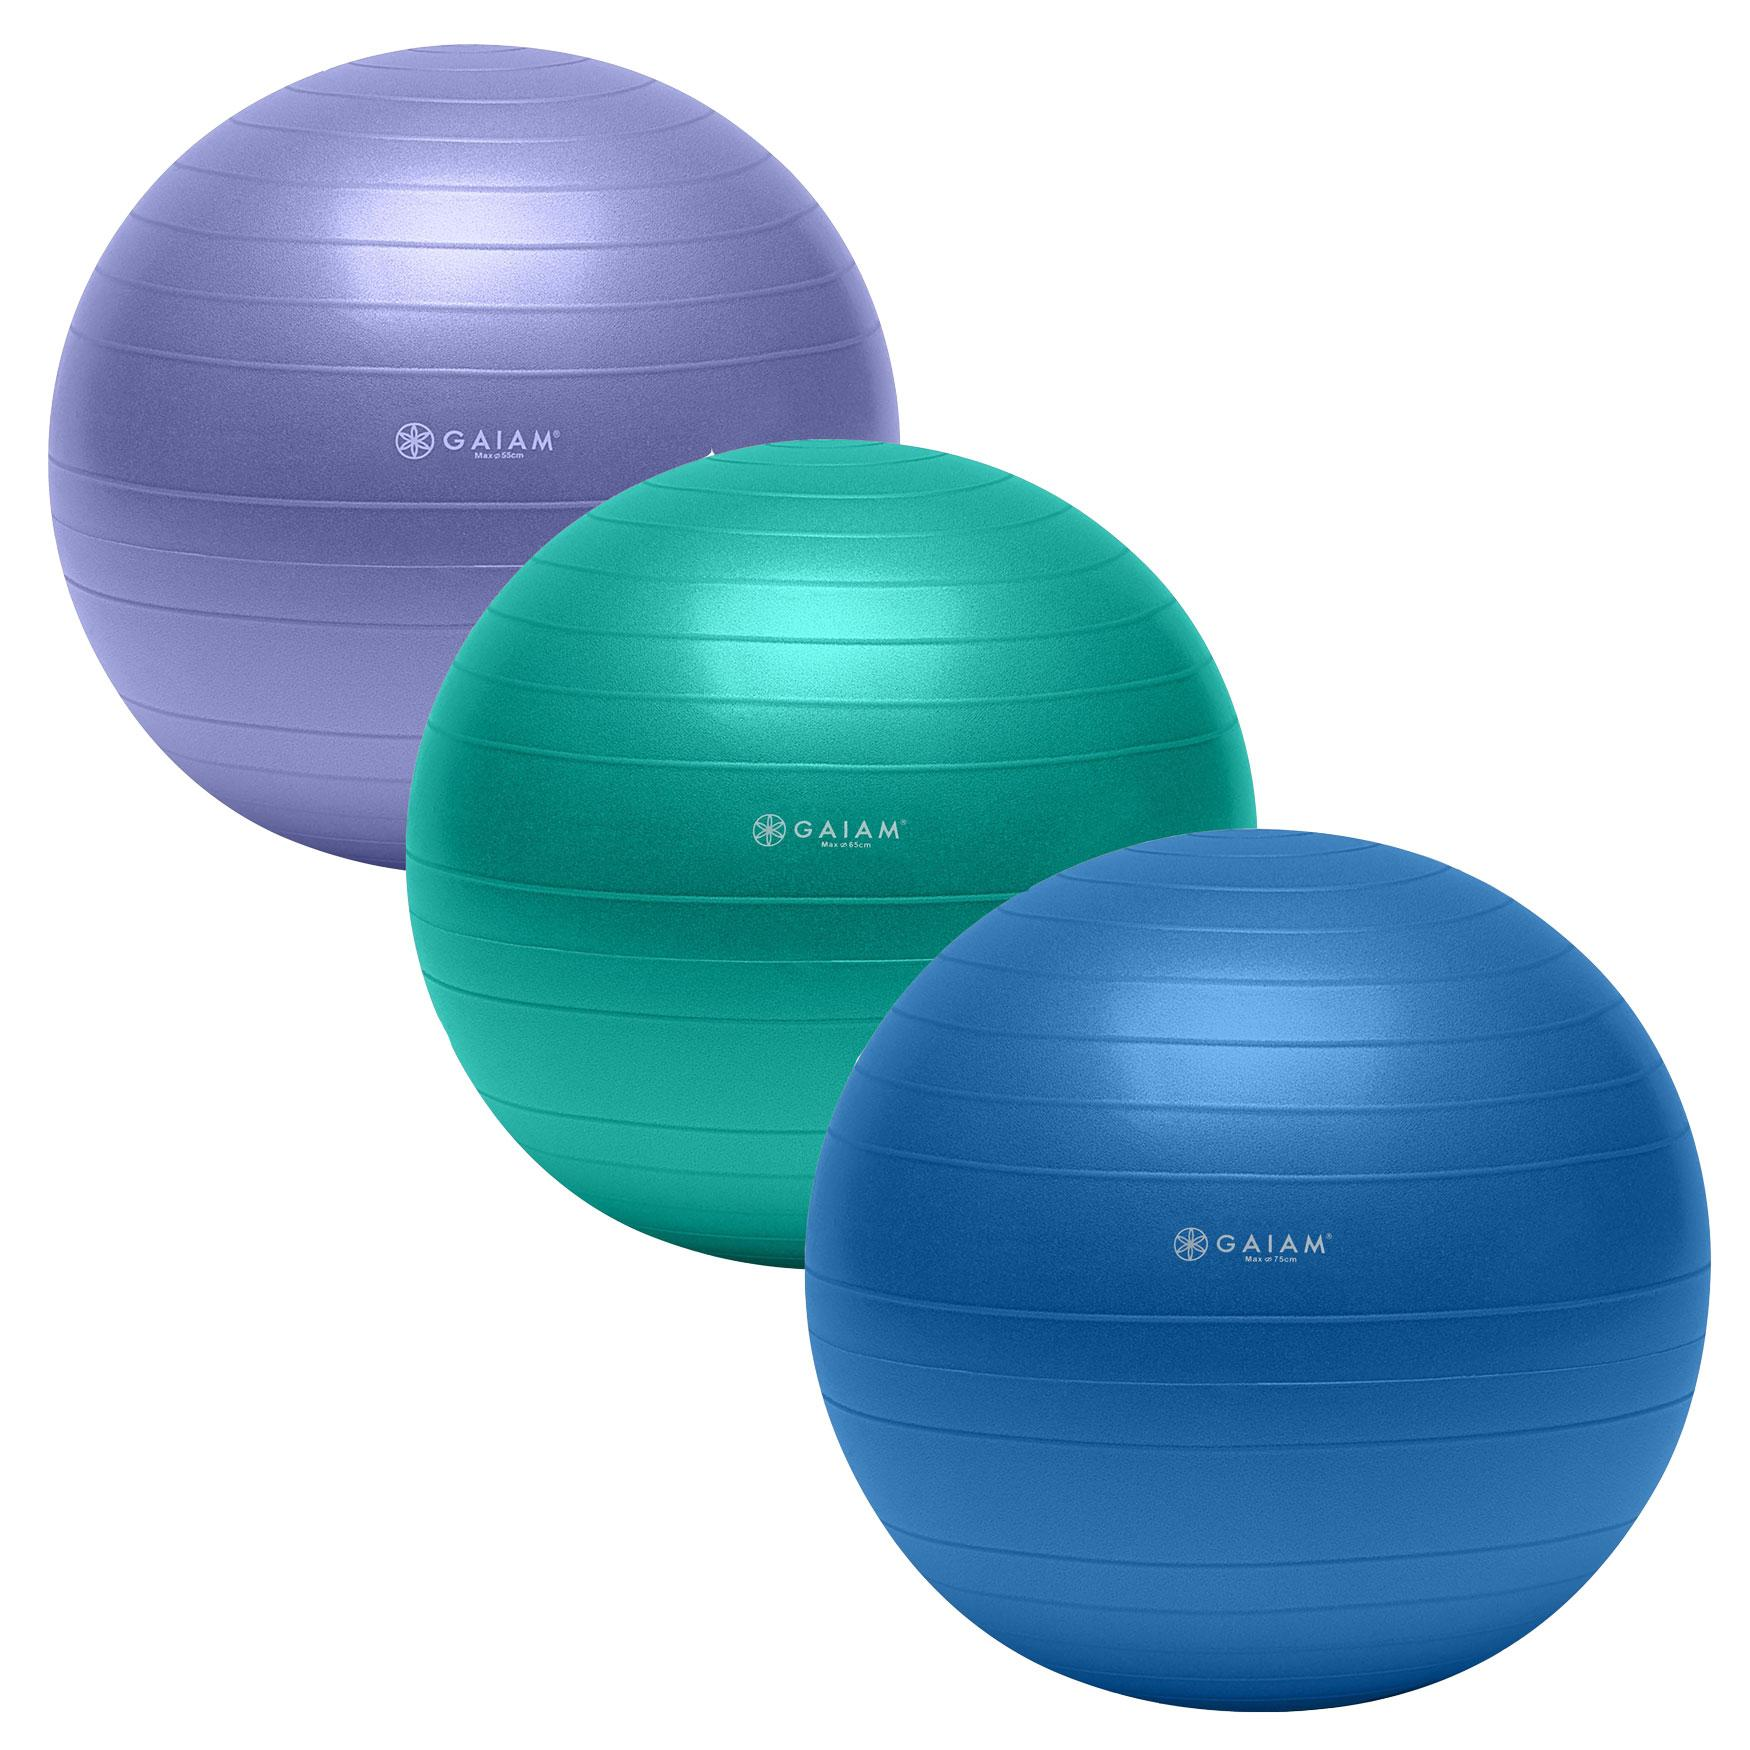 Amazon Gaiam Total Body Balance Ball Kit Includes 75cm